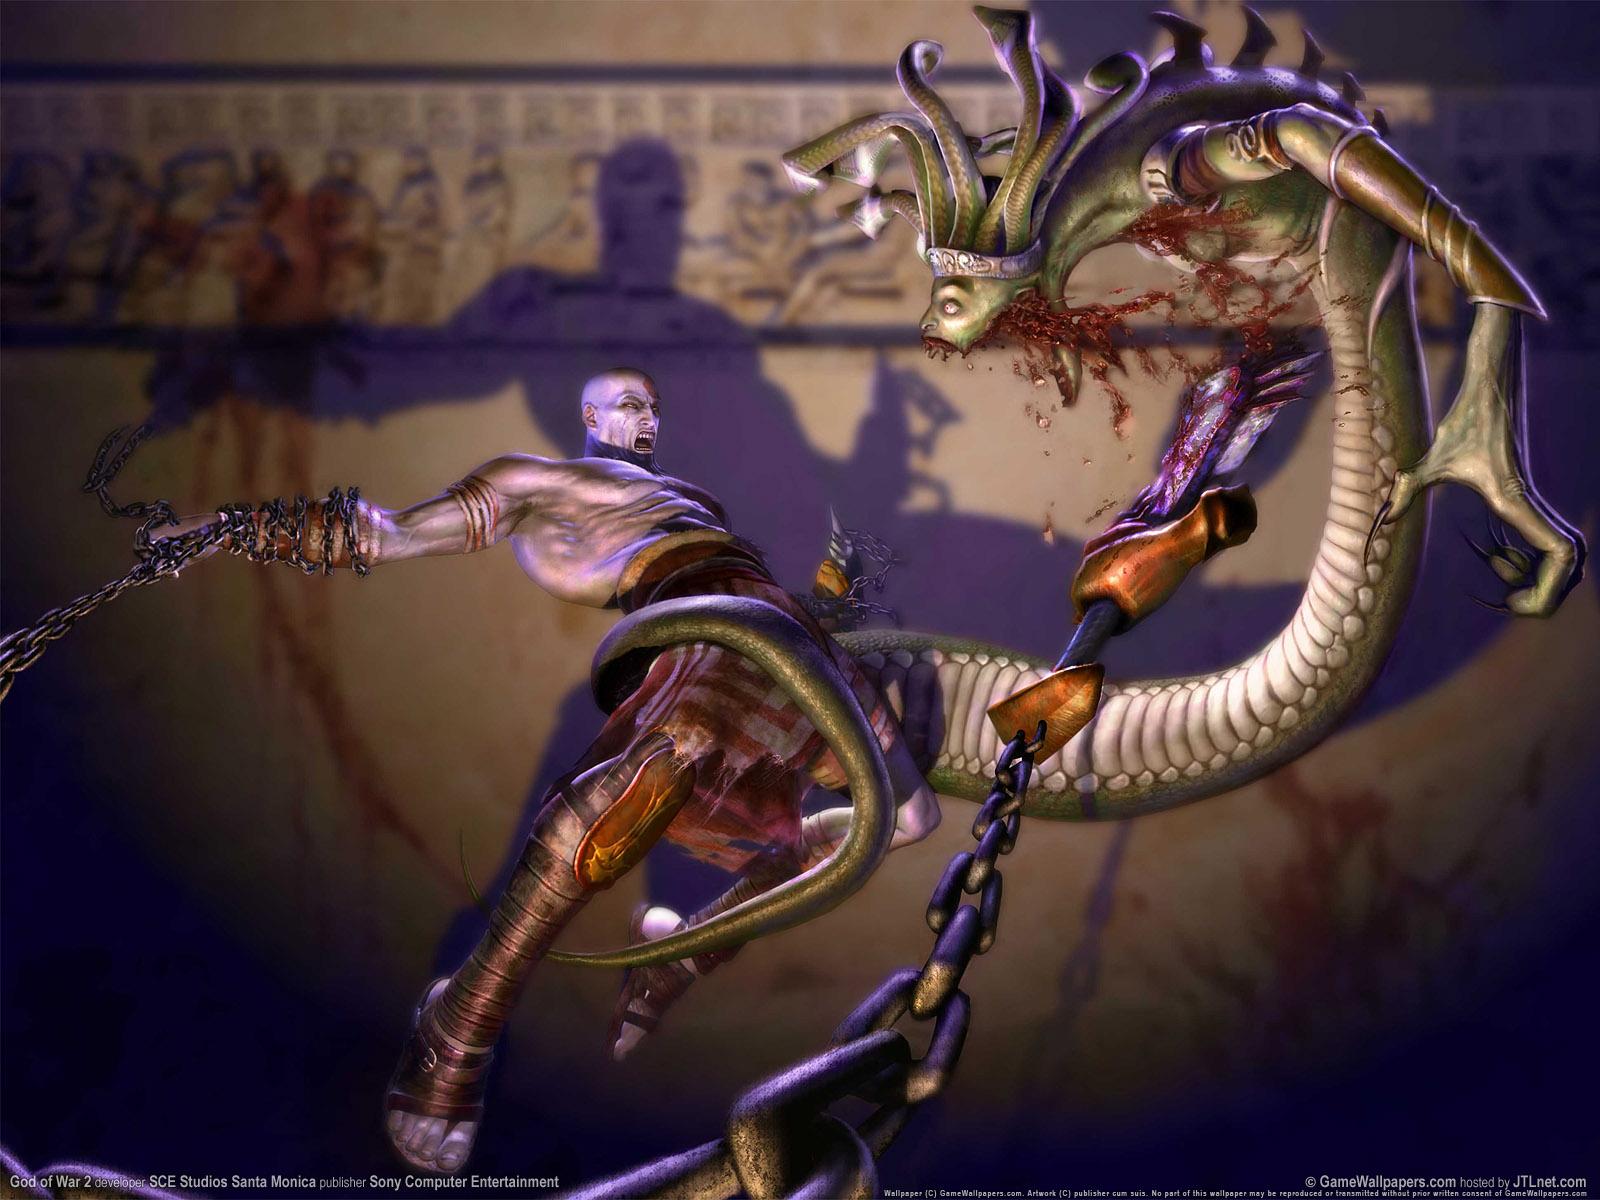 http://1.bp.blogspot.com/-bdHl13JeZjI/TdpAXdQ4ndI/AAAAAAAAAh0/e4-yLjyMbSk/s1600/wallpaper_god_of_war_2_08_1600.jpg